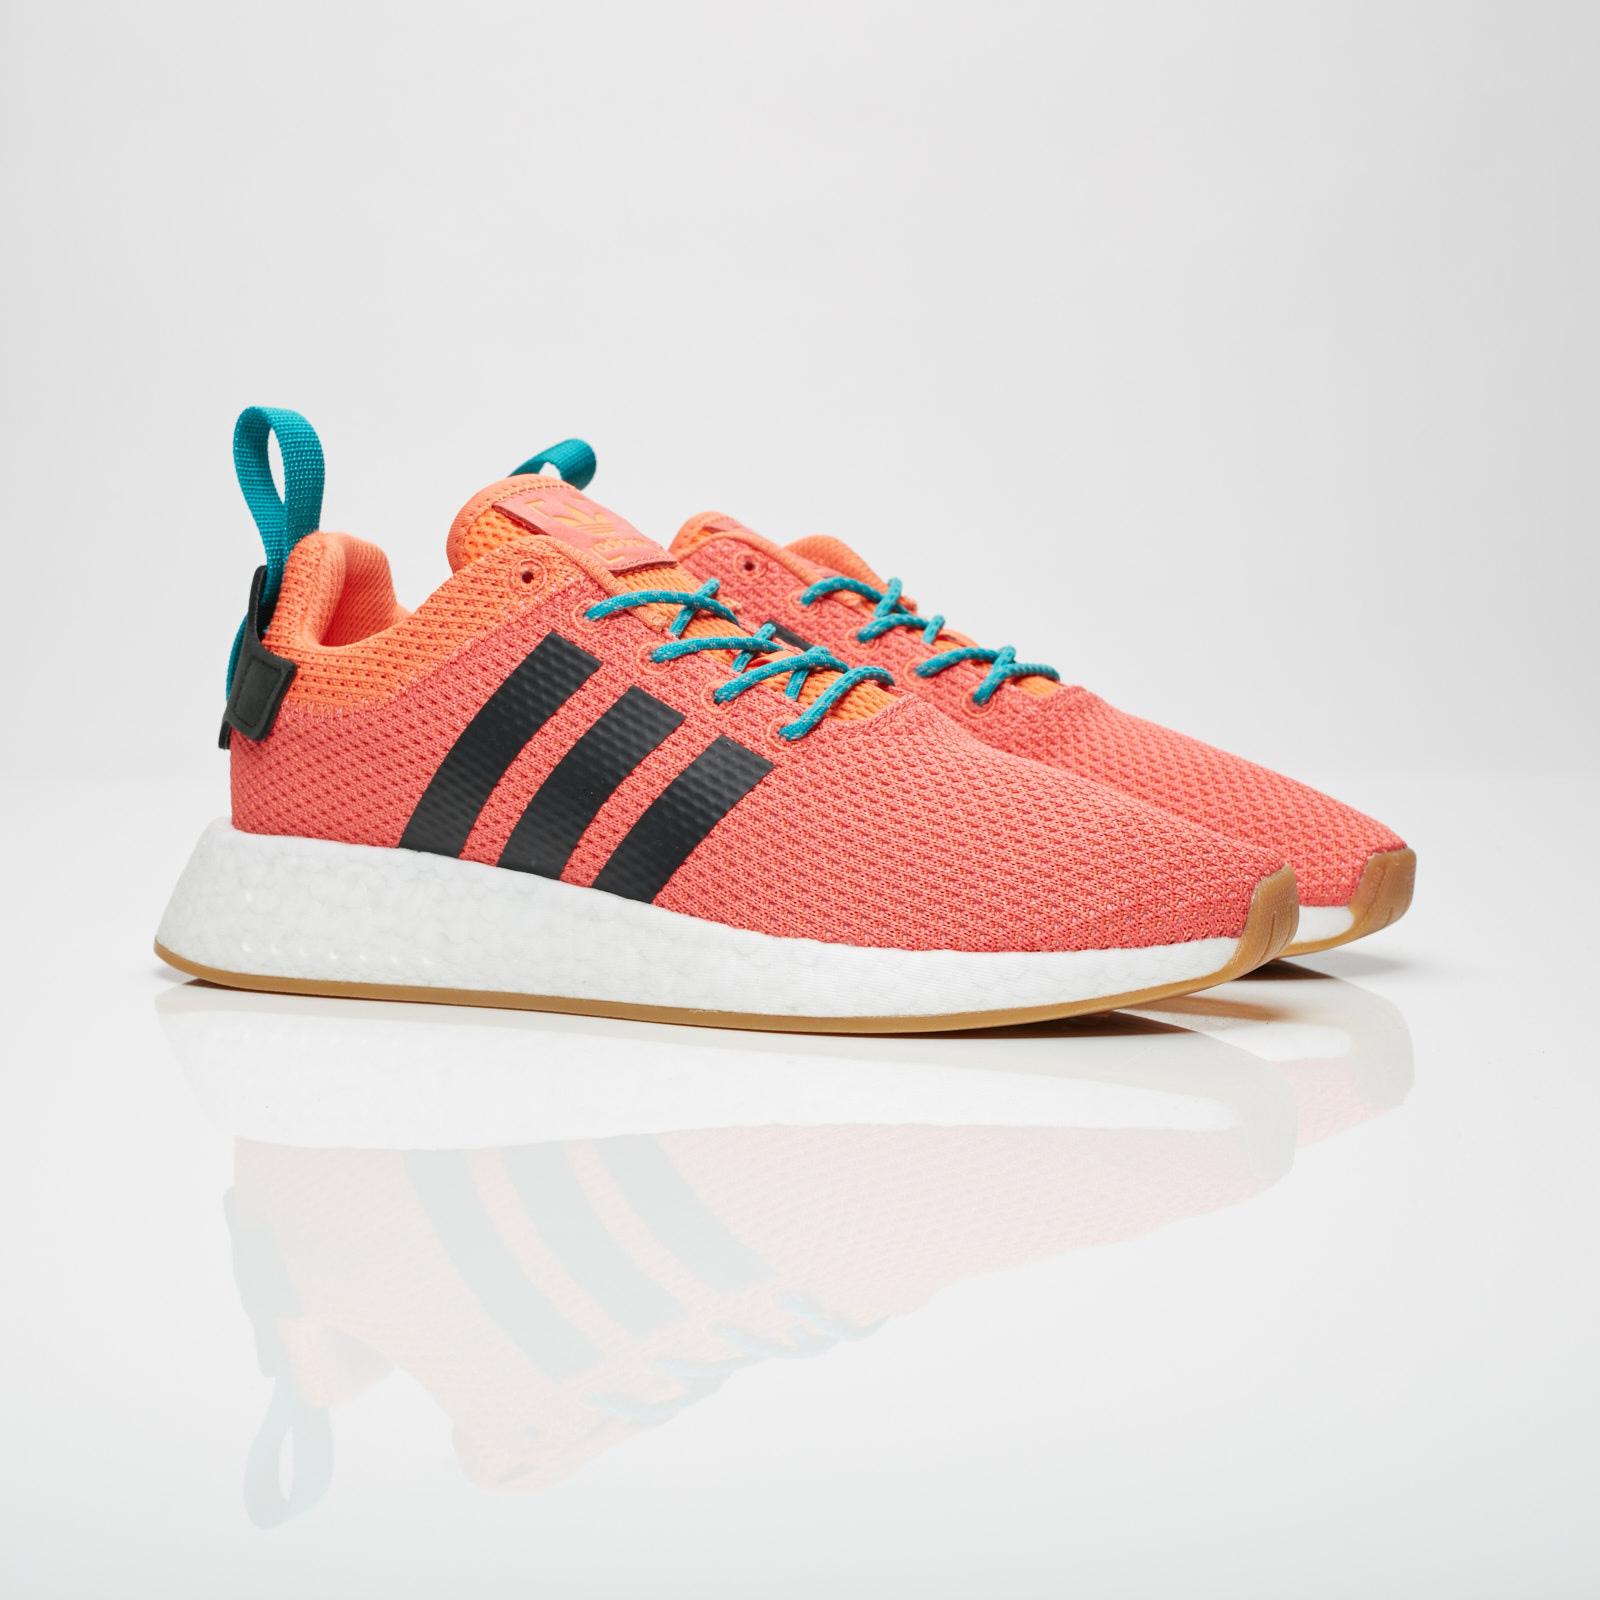 1ff1c0c47256 adidas NMD R2 Summer - Cq3081 - Sneakersnstuff